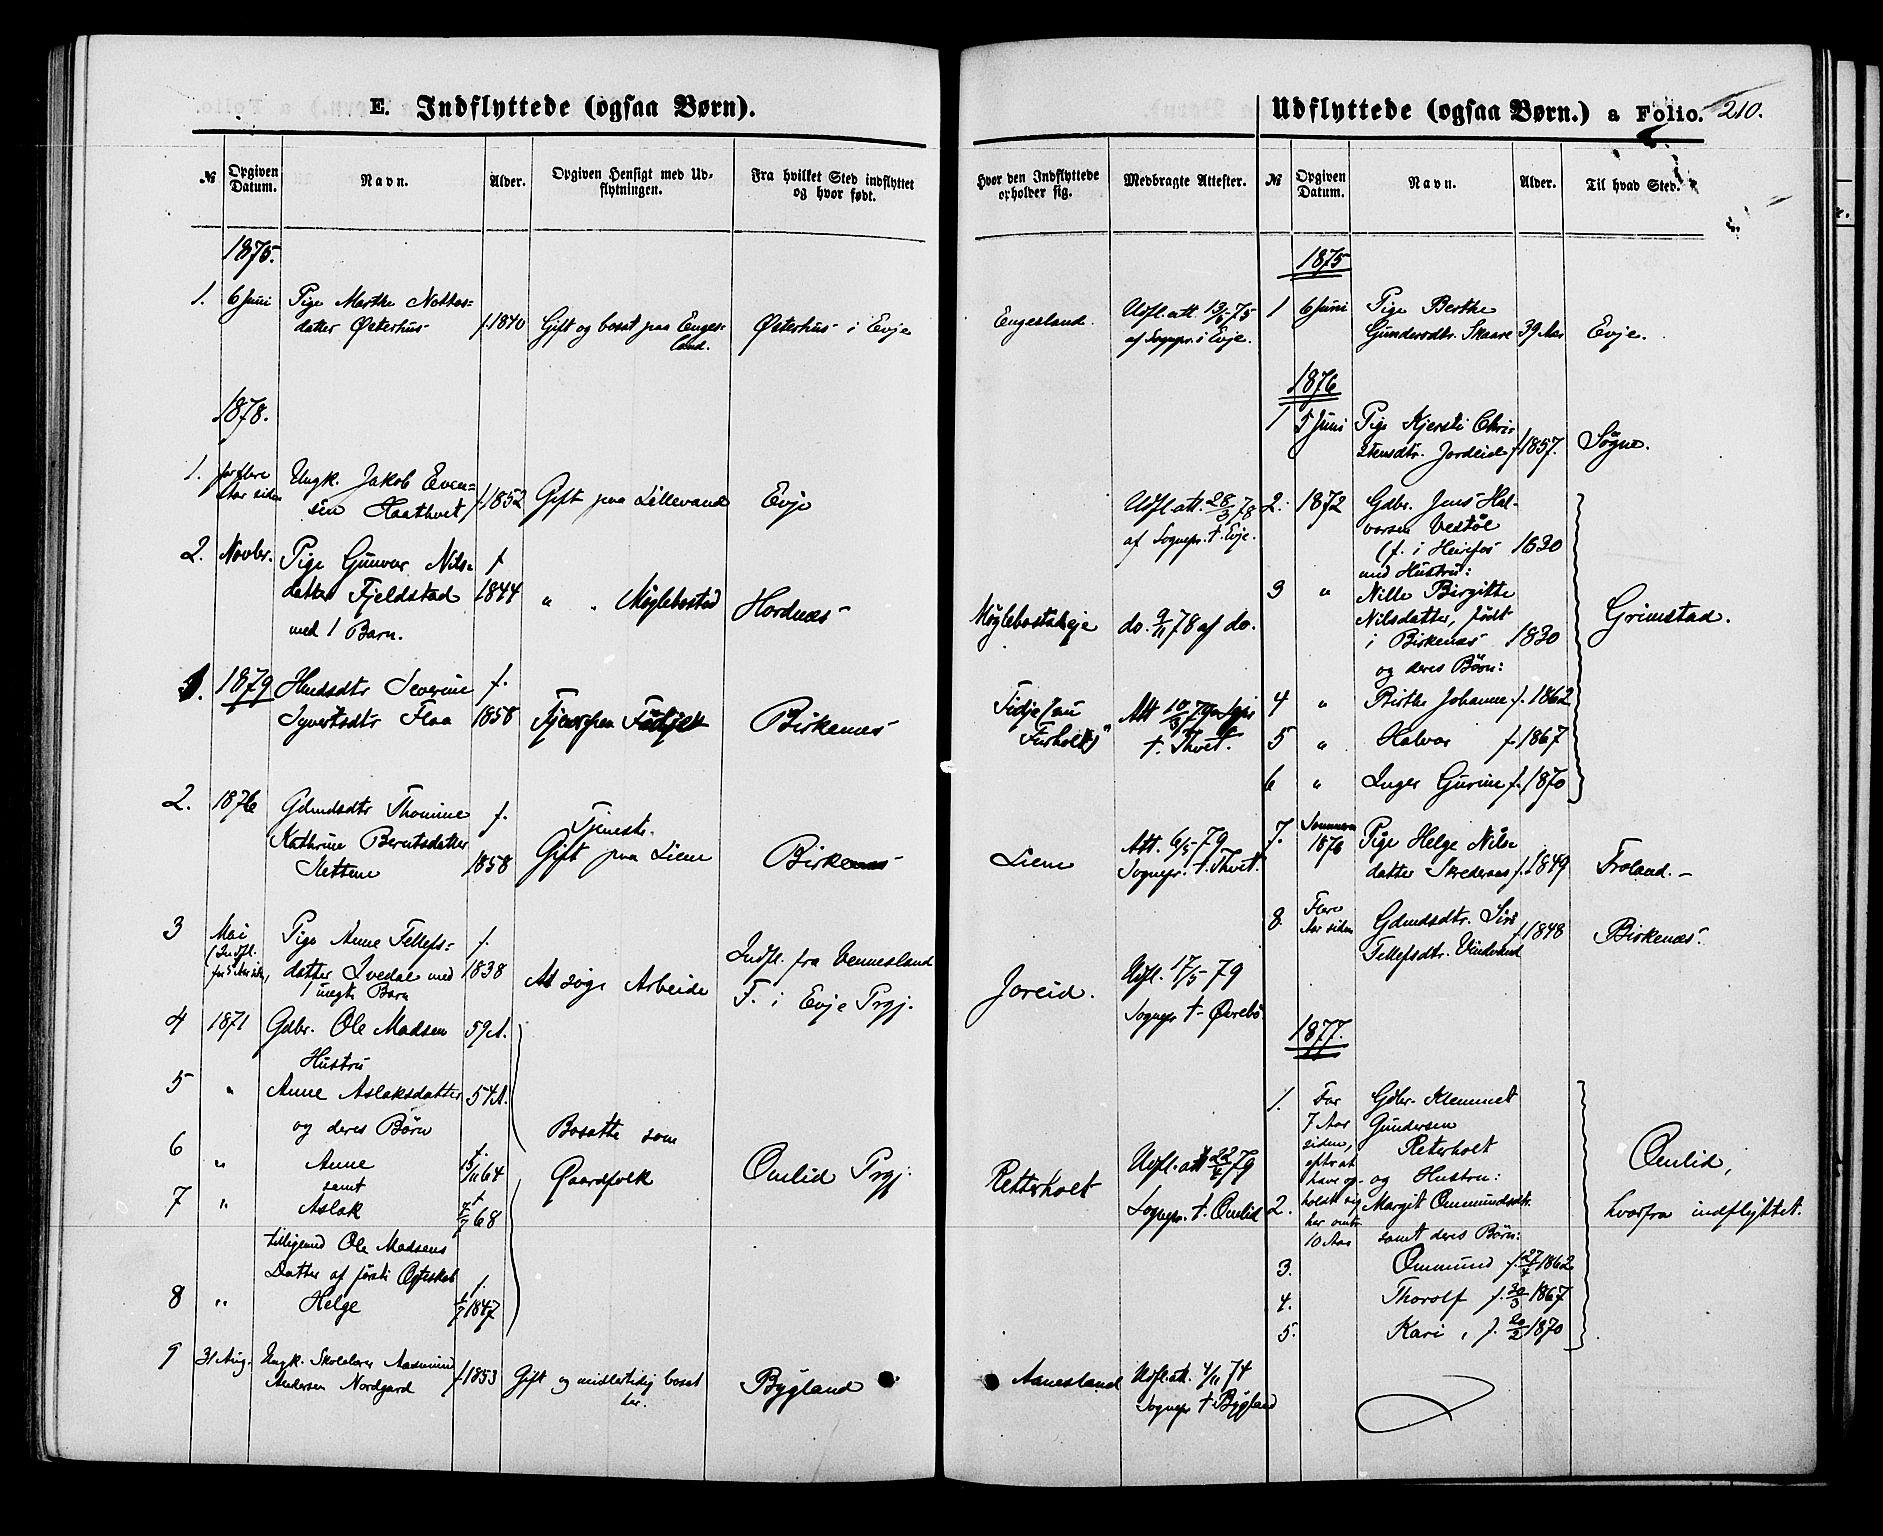 SAK, Herefoss sokneprestkontor, F/Fa/Fab/L0003: Ministerialbok nr. A 3, 1875-1886, s. 210